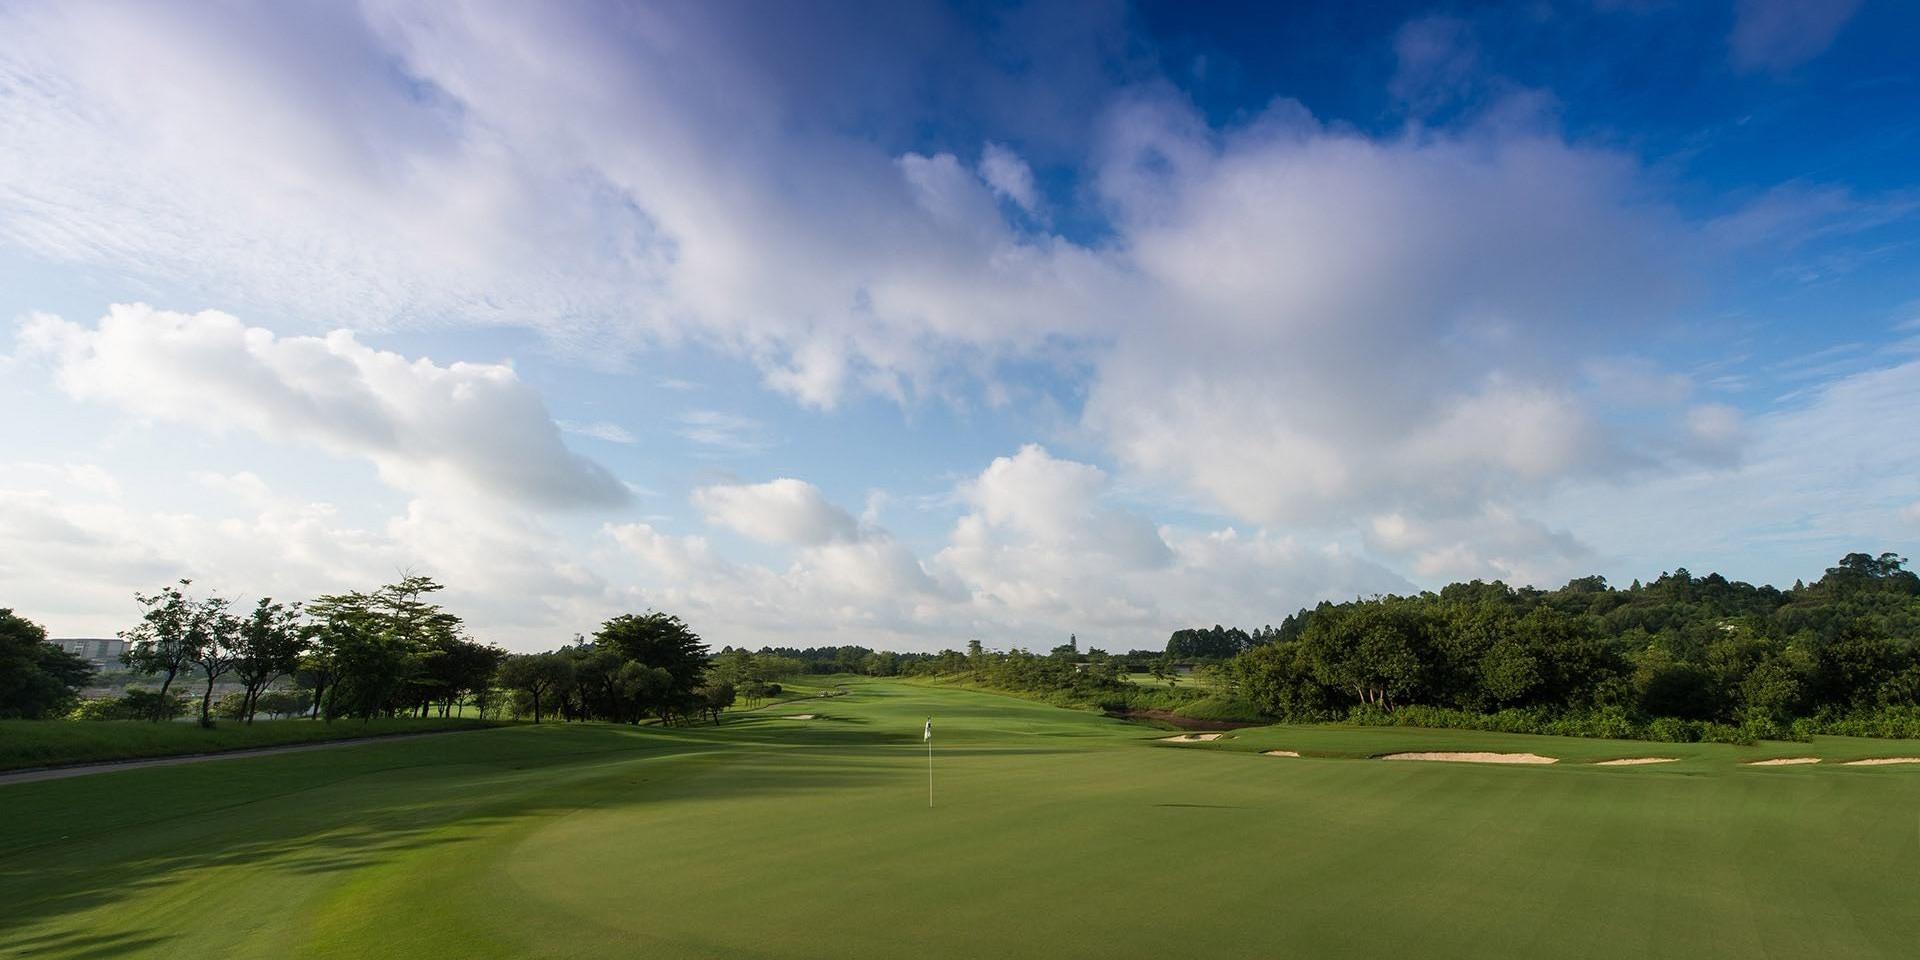 Foshan Golf Club Venue Spotlight